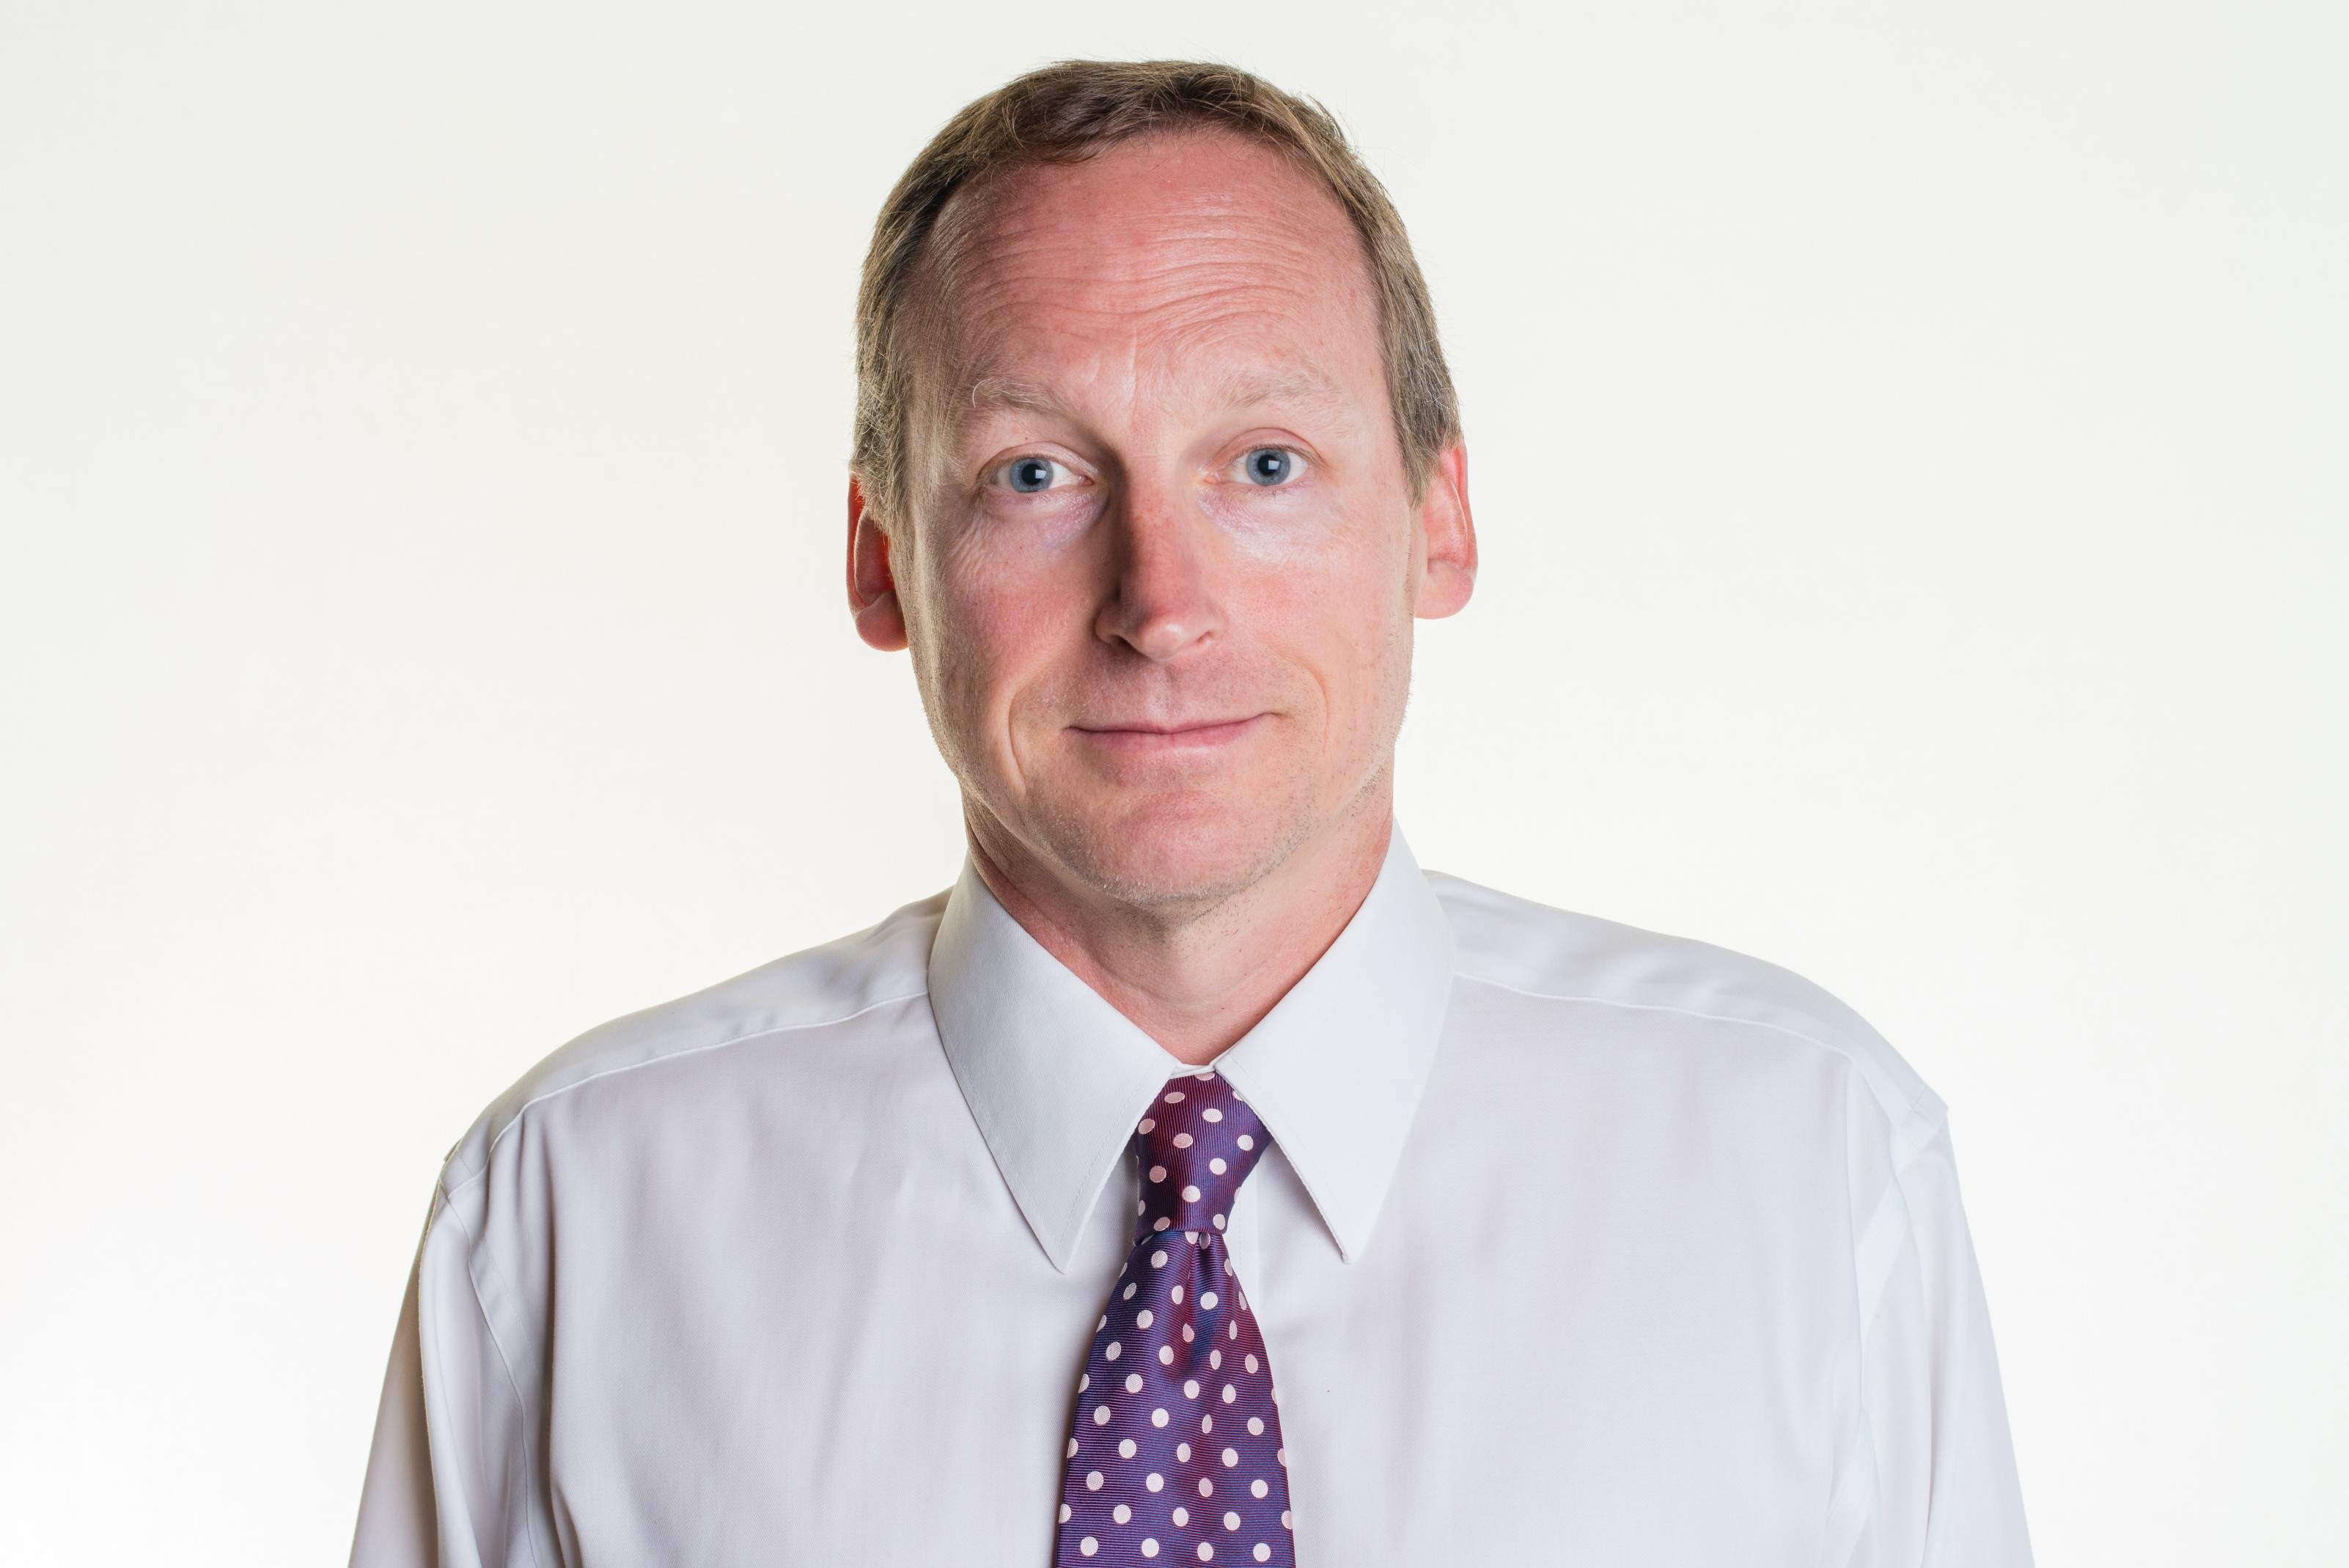 Simon Martyn